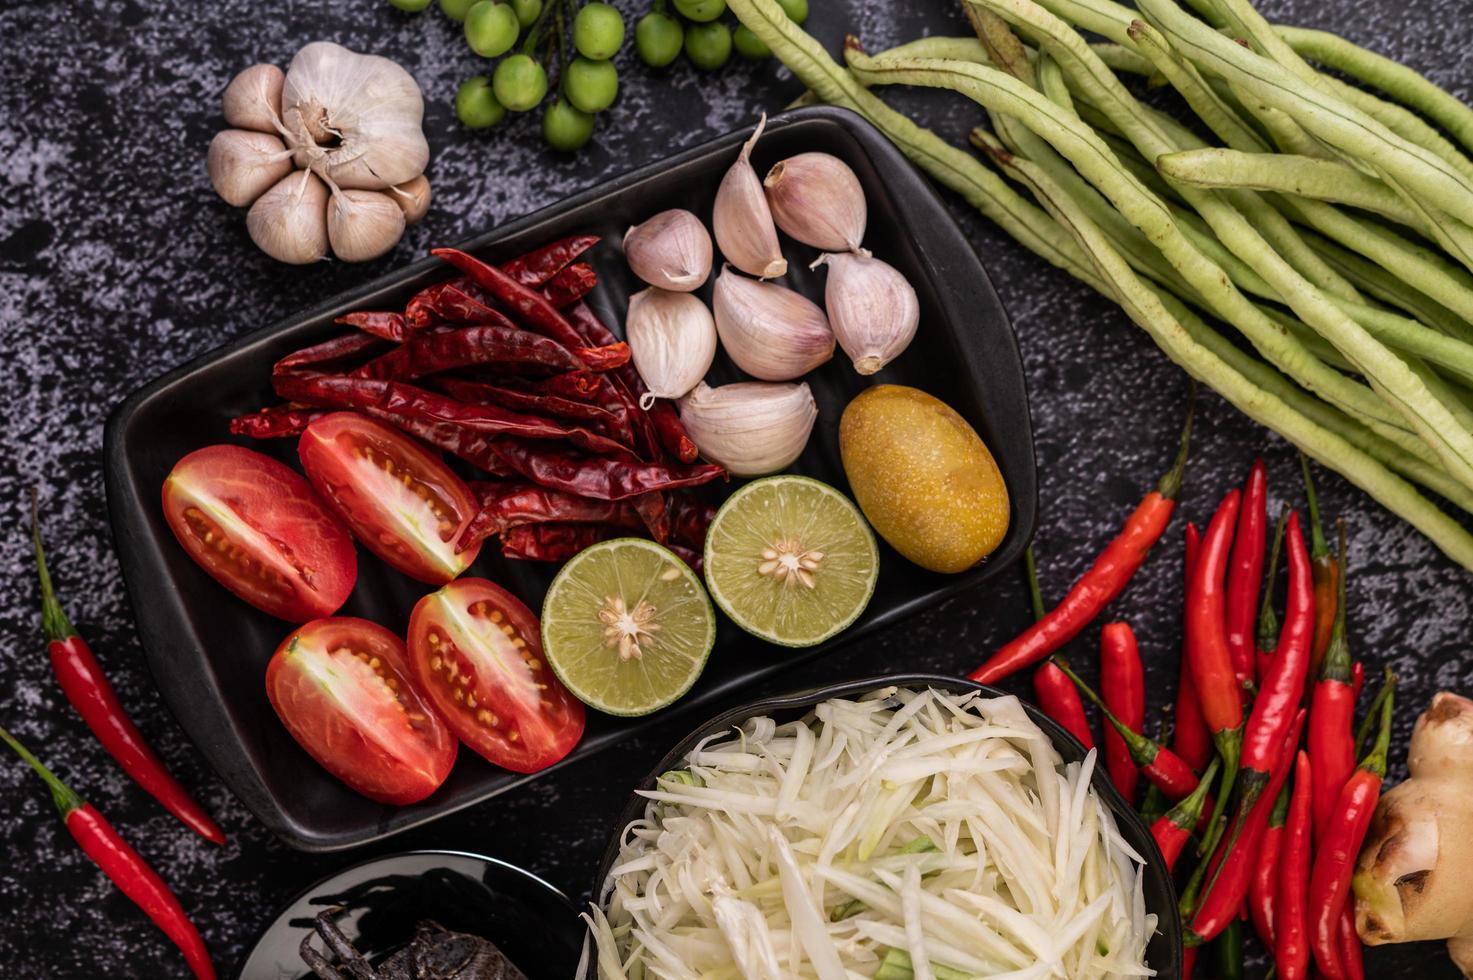 papajasalade ingrediënten met gefermenteerde vis foto